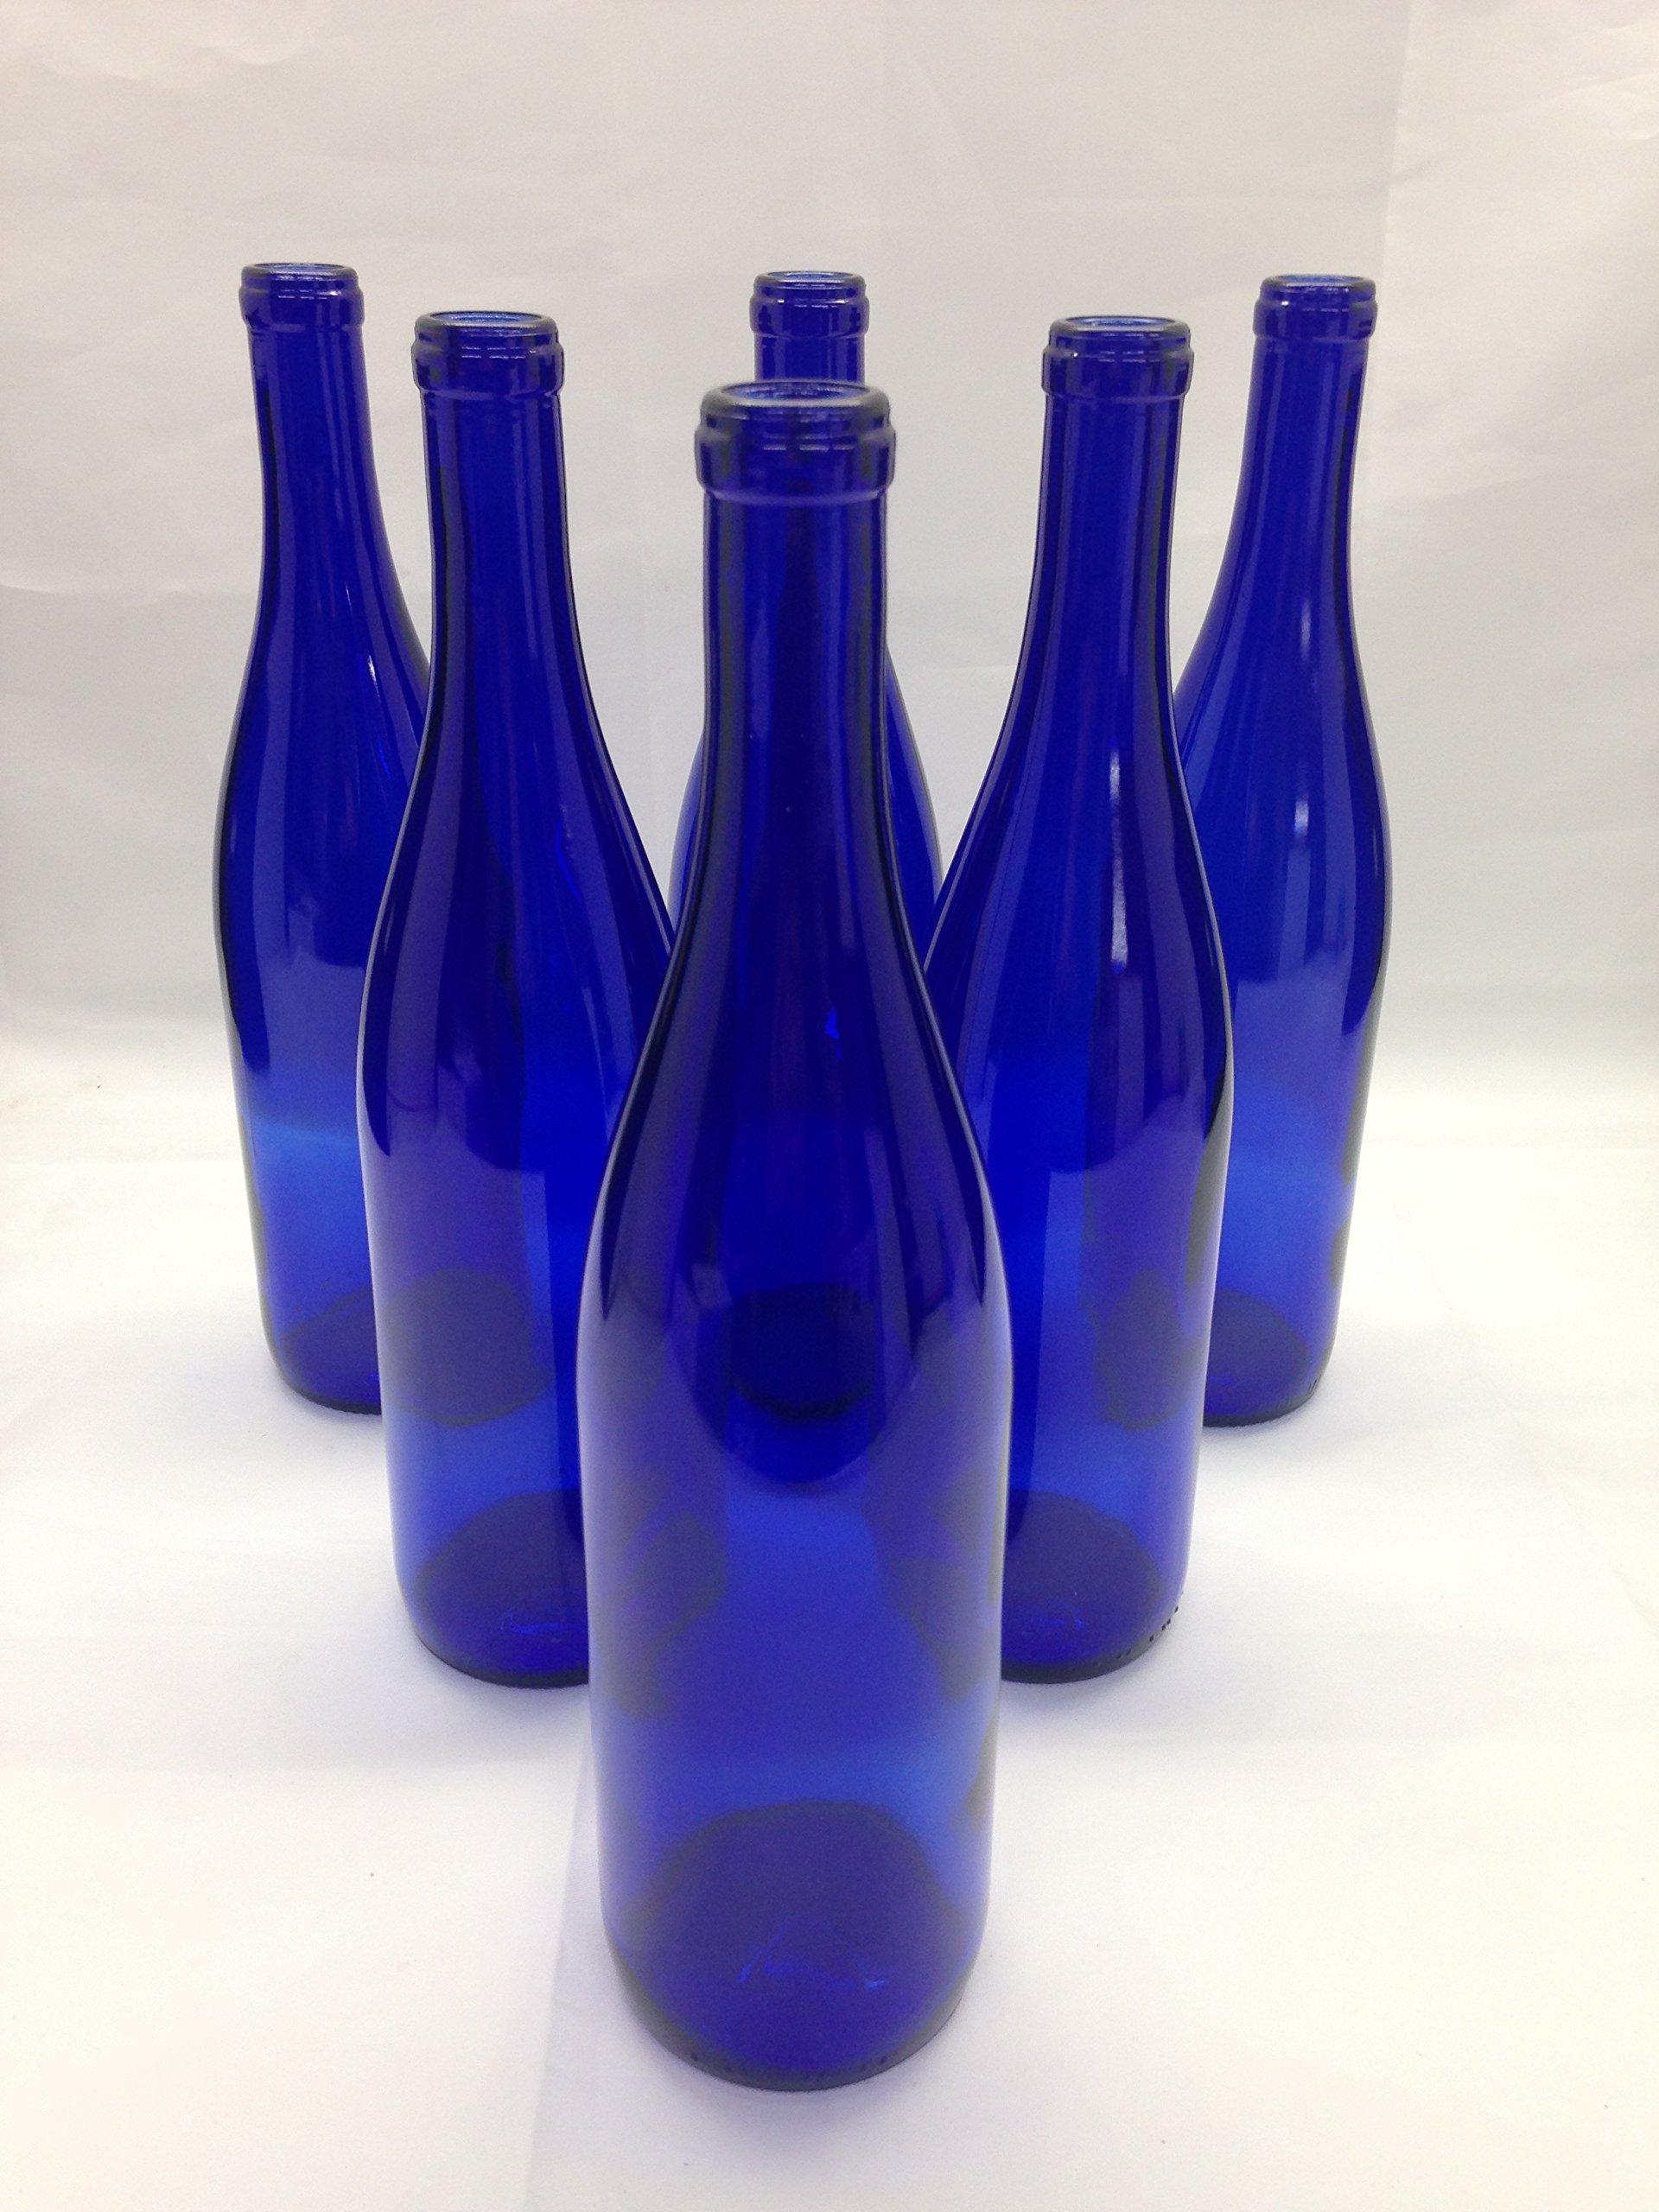 6 - Deep Cobalt Blue Stretch Neck Hock Flat Bottom 750ml for Bottle Trees, Crafting, Parties,Wedding Center Piece , Decor , Home Brew , Beer, Wine